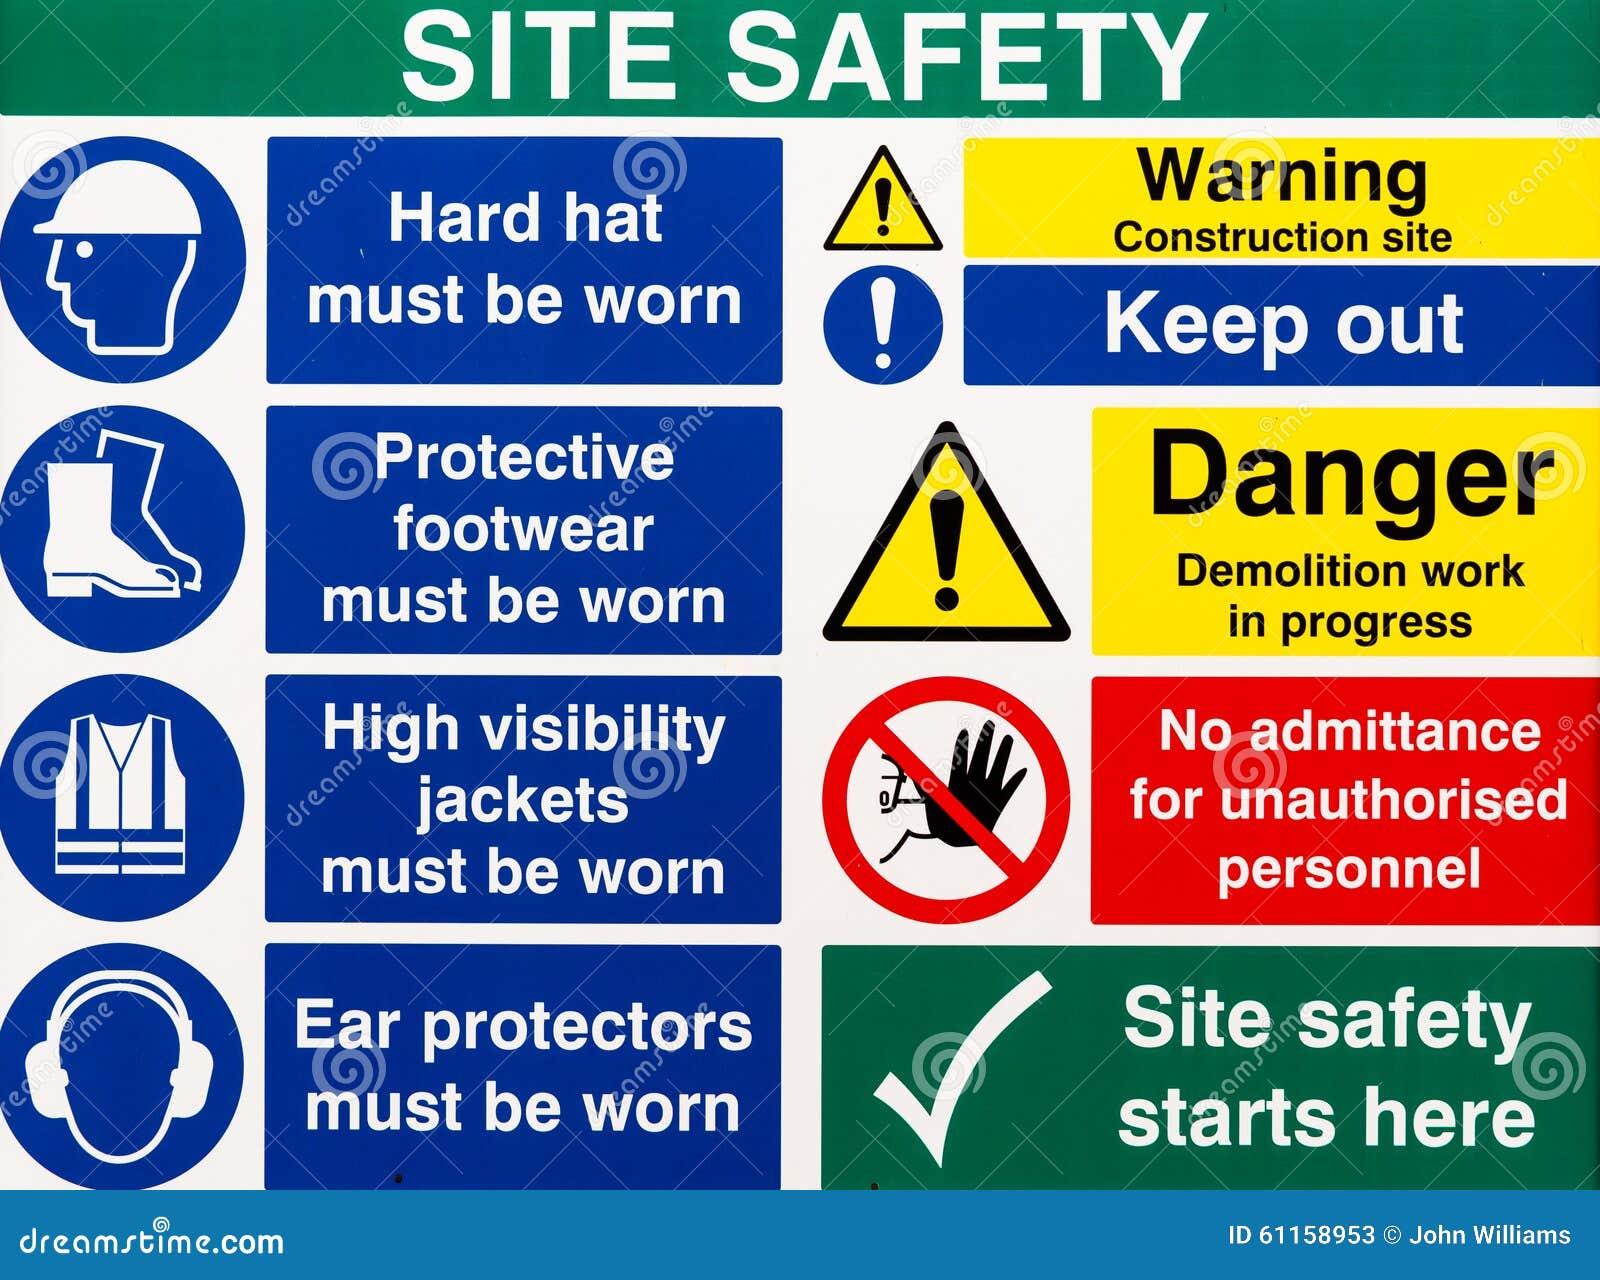 site saftey warning signs stock image image of hazard 61158953